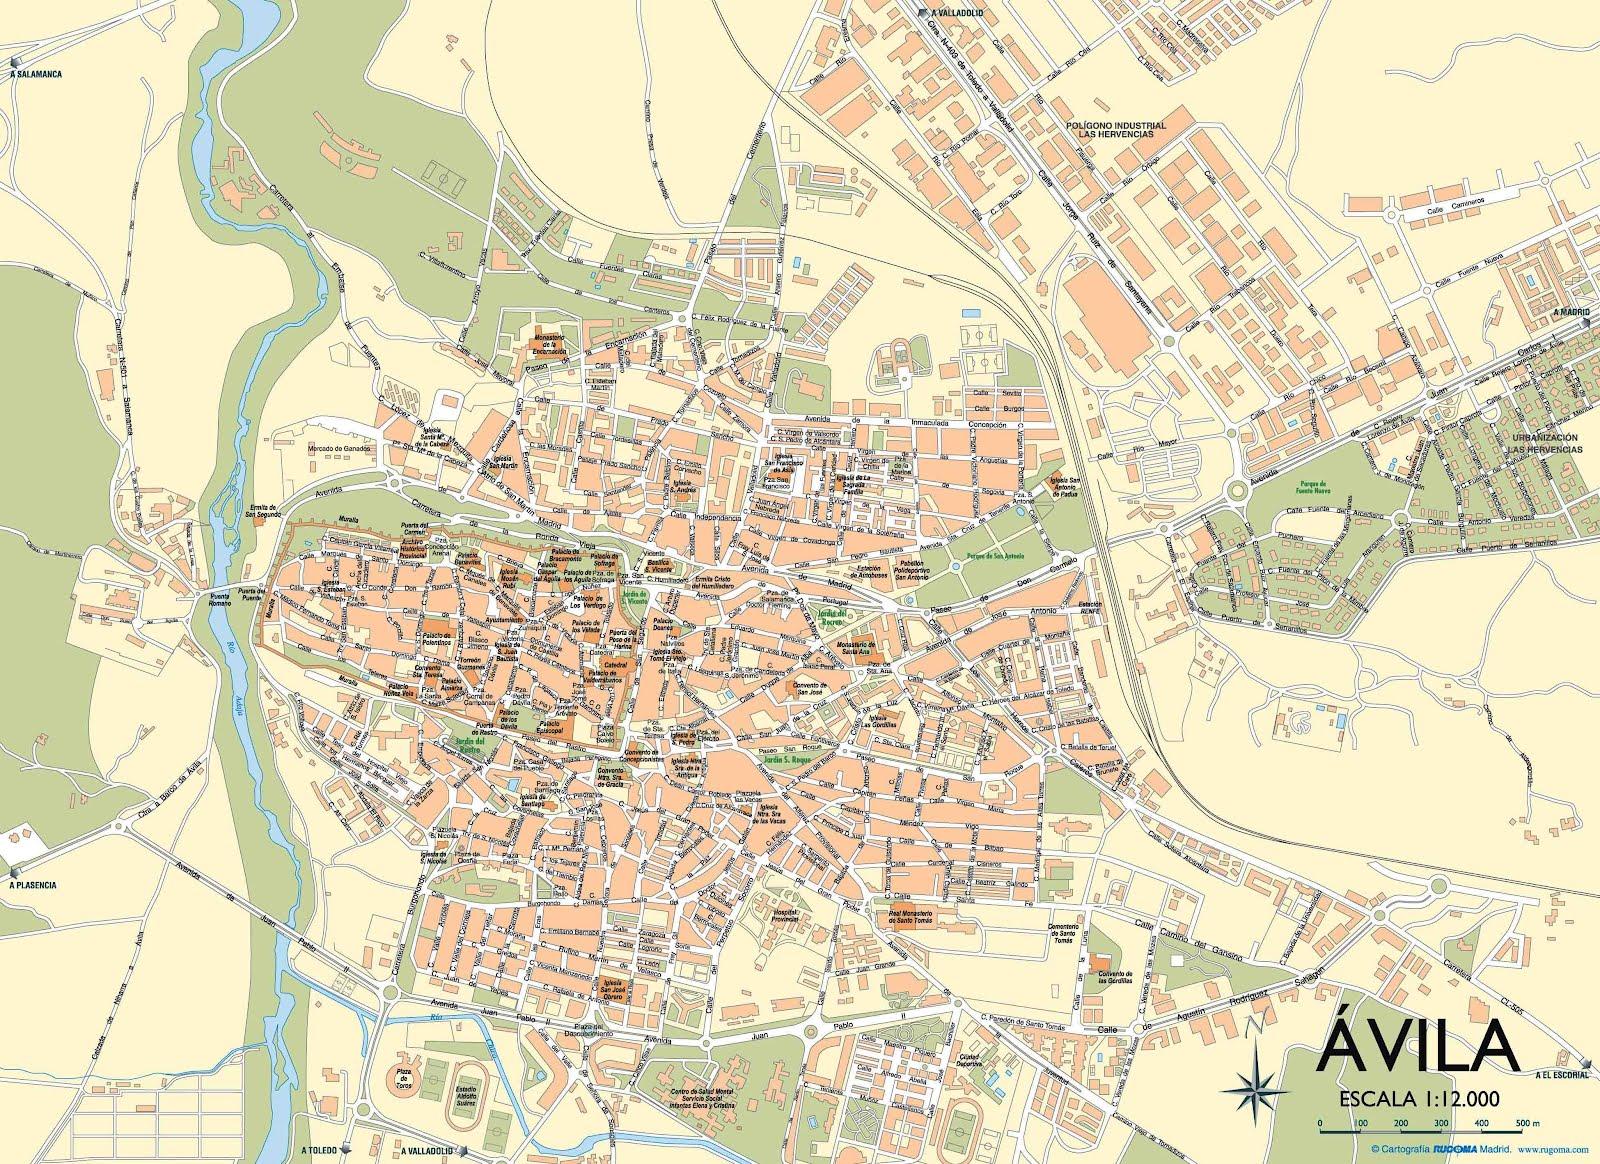 avila espanha mapa Mapas de Avila   Espanha | MapasBlog avila espanha mapa